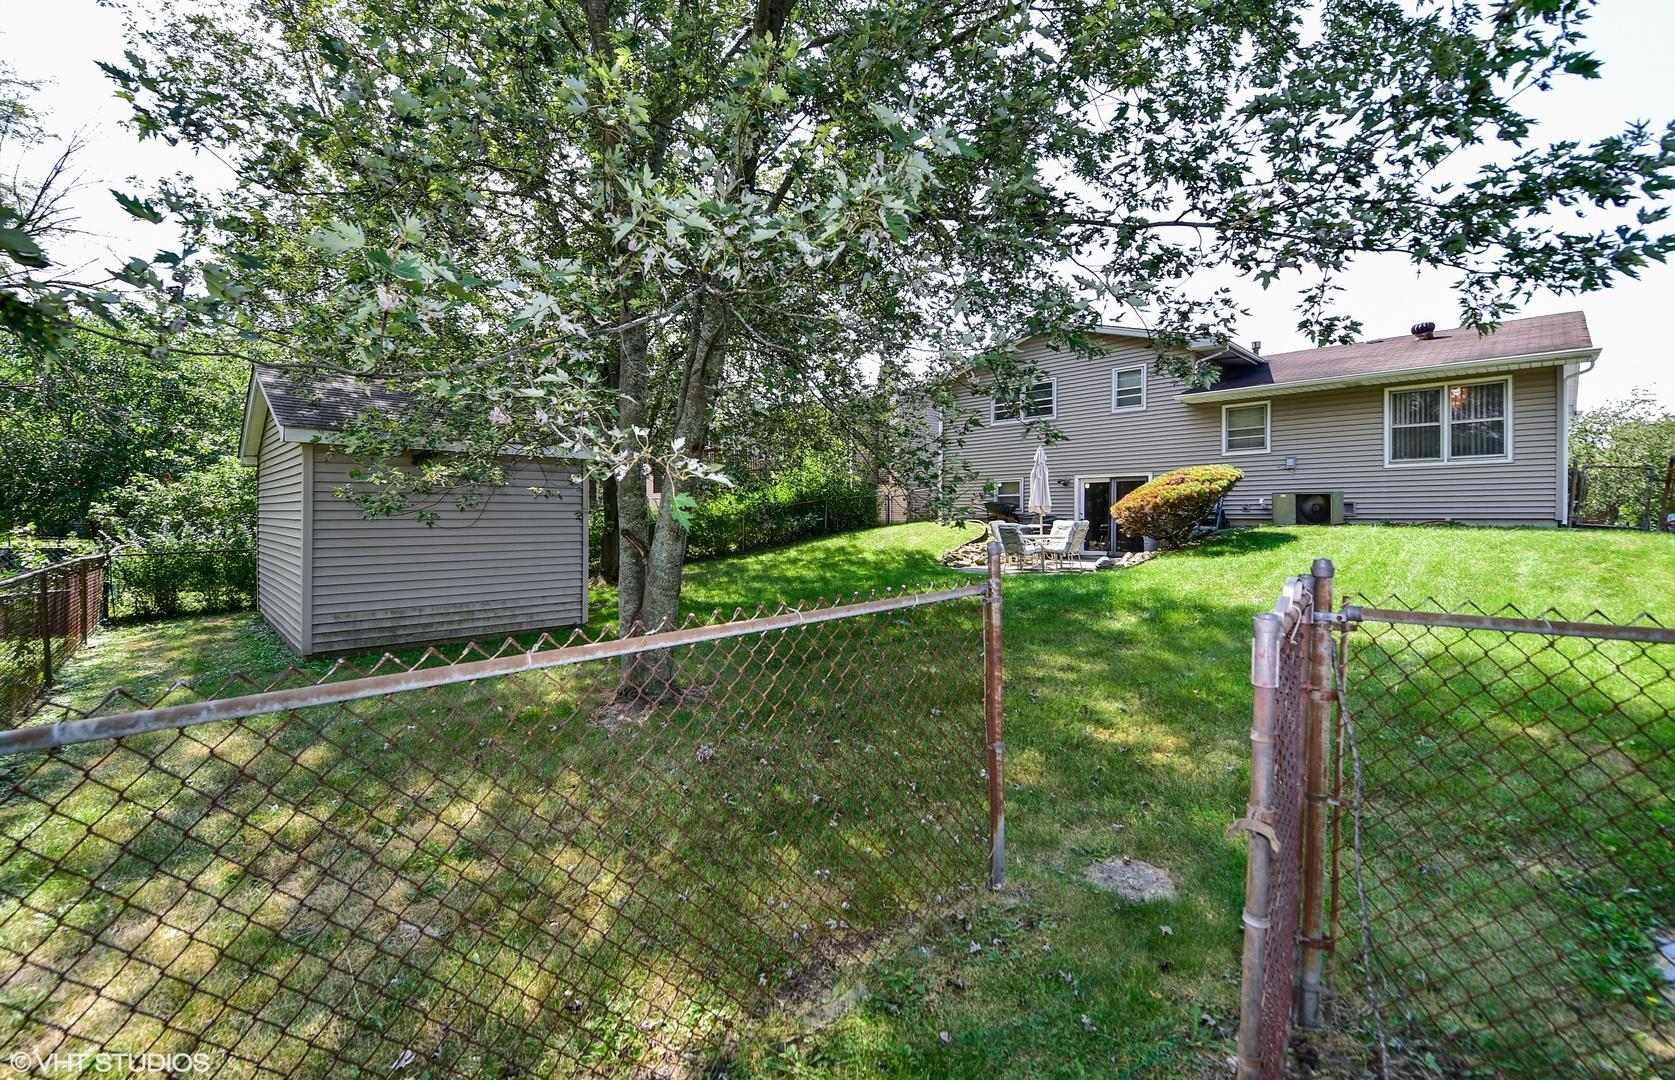 19829 Orchard ,Lynwood, Illinois 60411